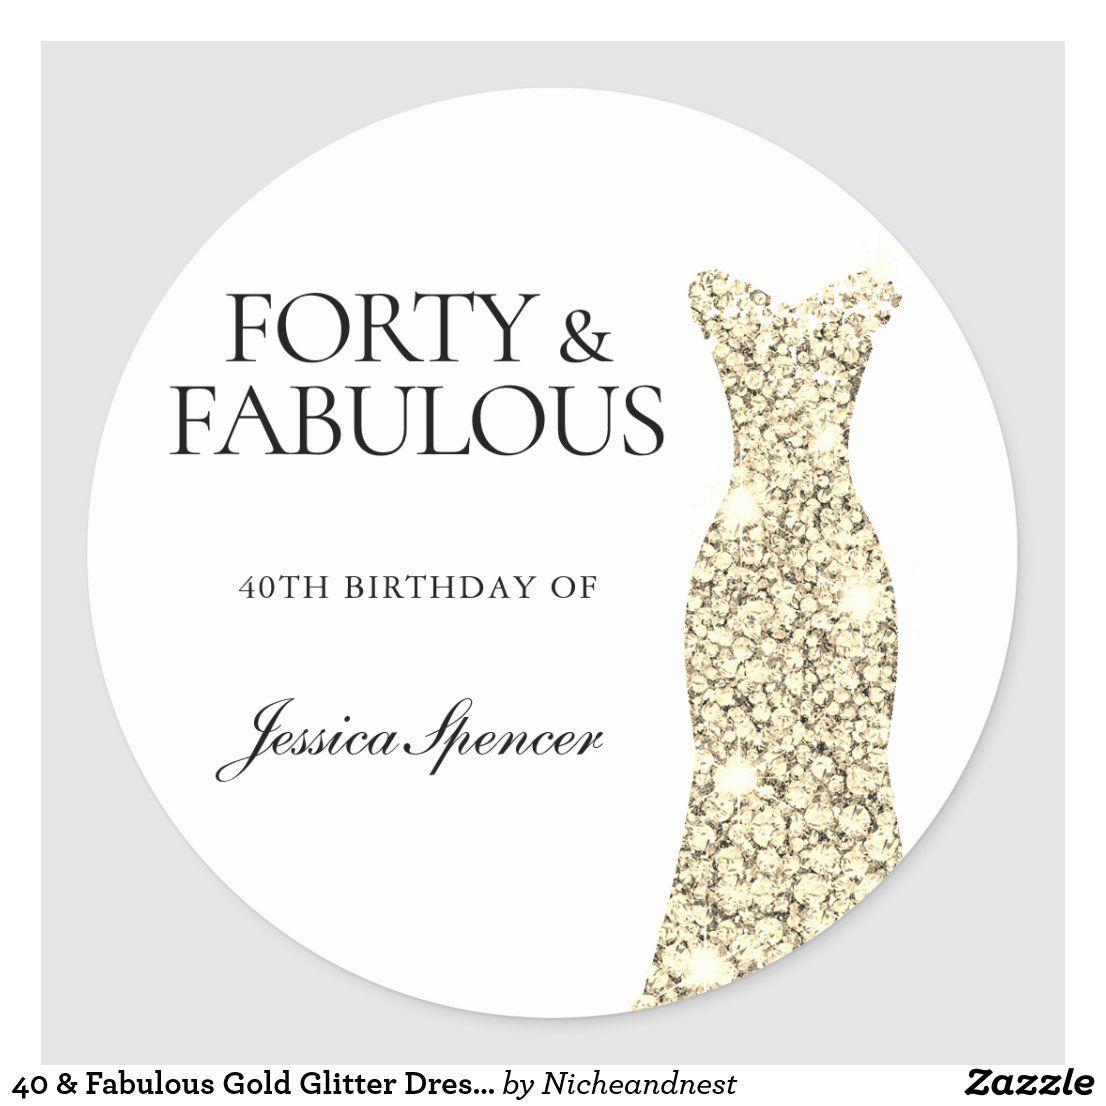 40 Fabulous Gold Glitter Dress 40th Birthday Classic Round Sticker Zazzle Com Gold Glitter Dress Glitter Dress 40 And Fabulous [ 1106 x 1106 Pixel ]